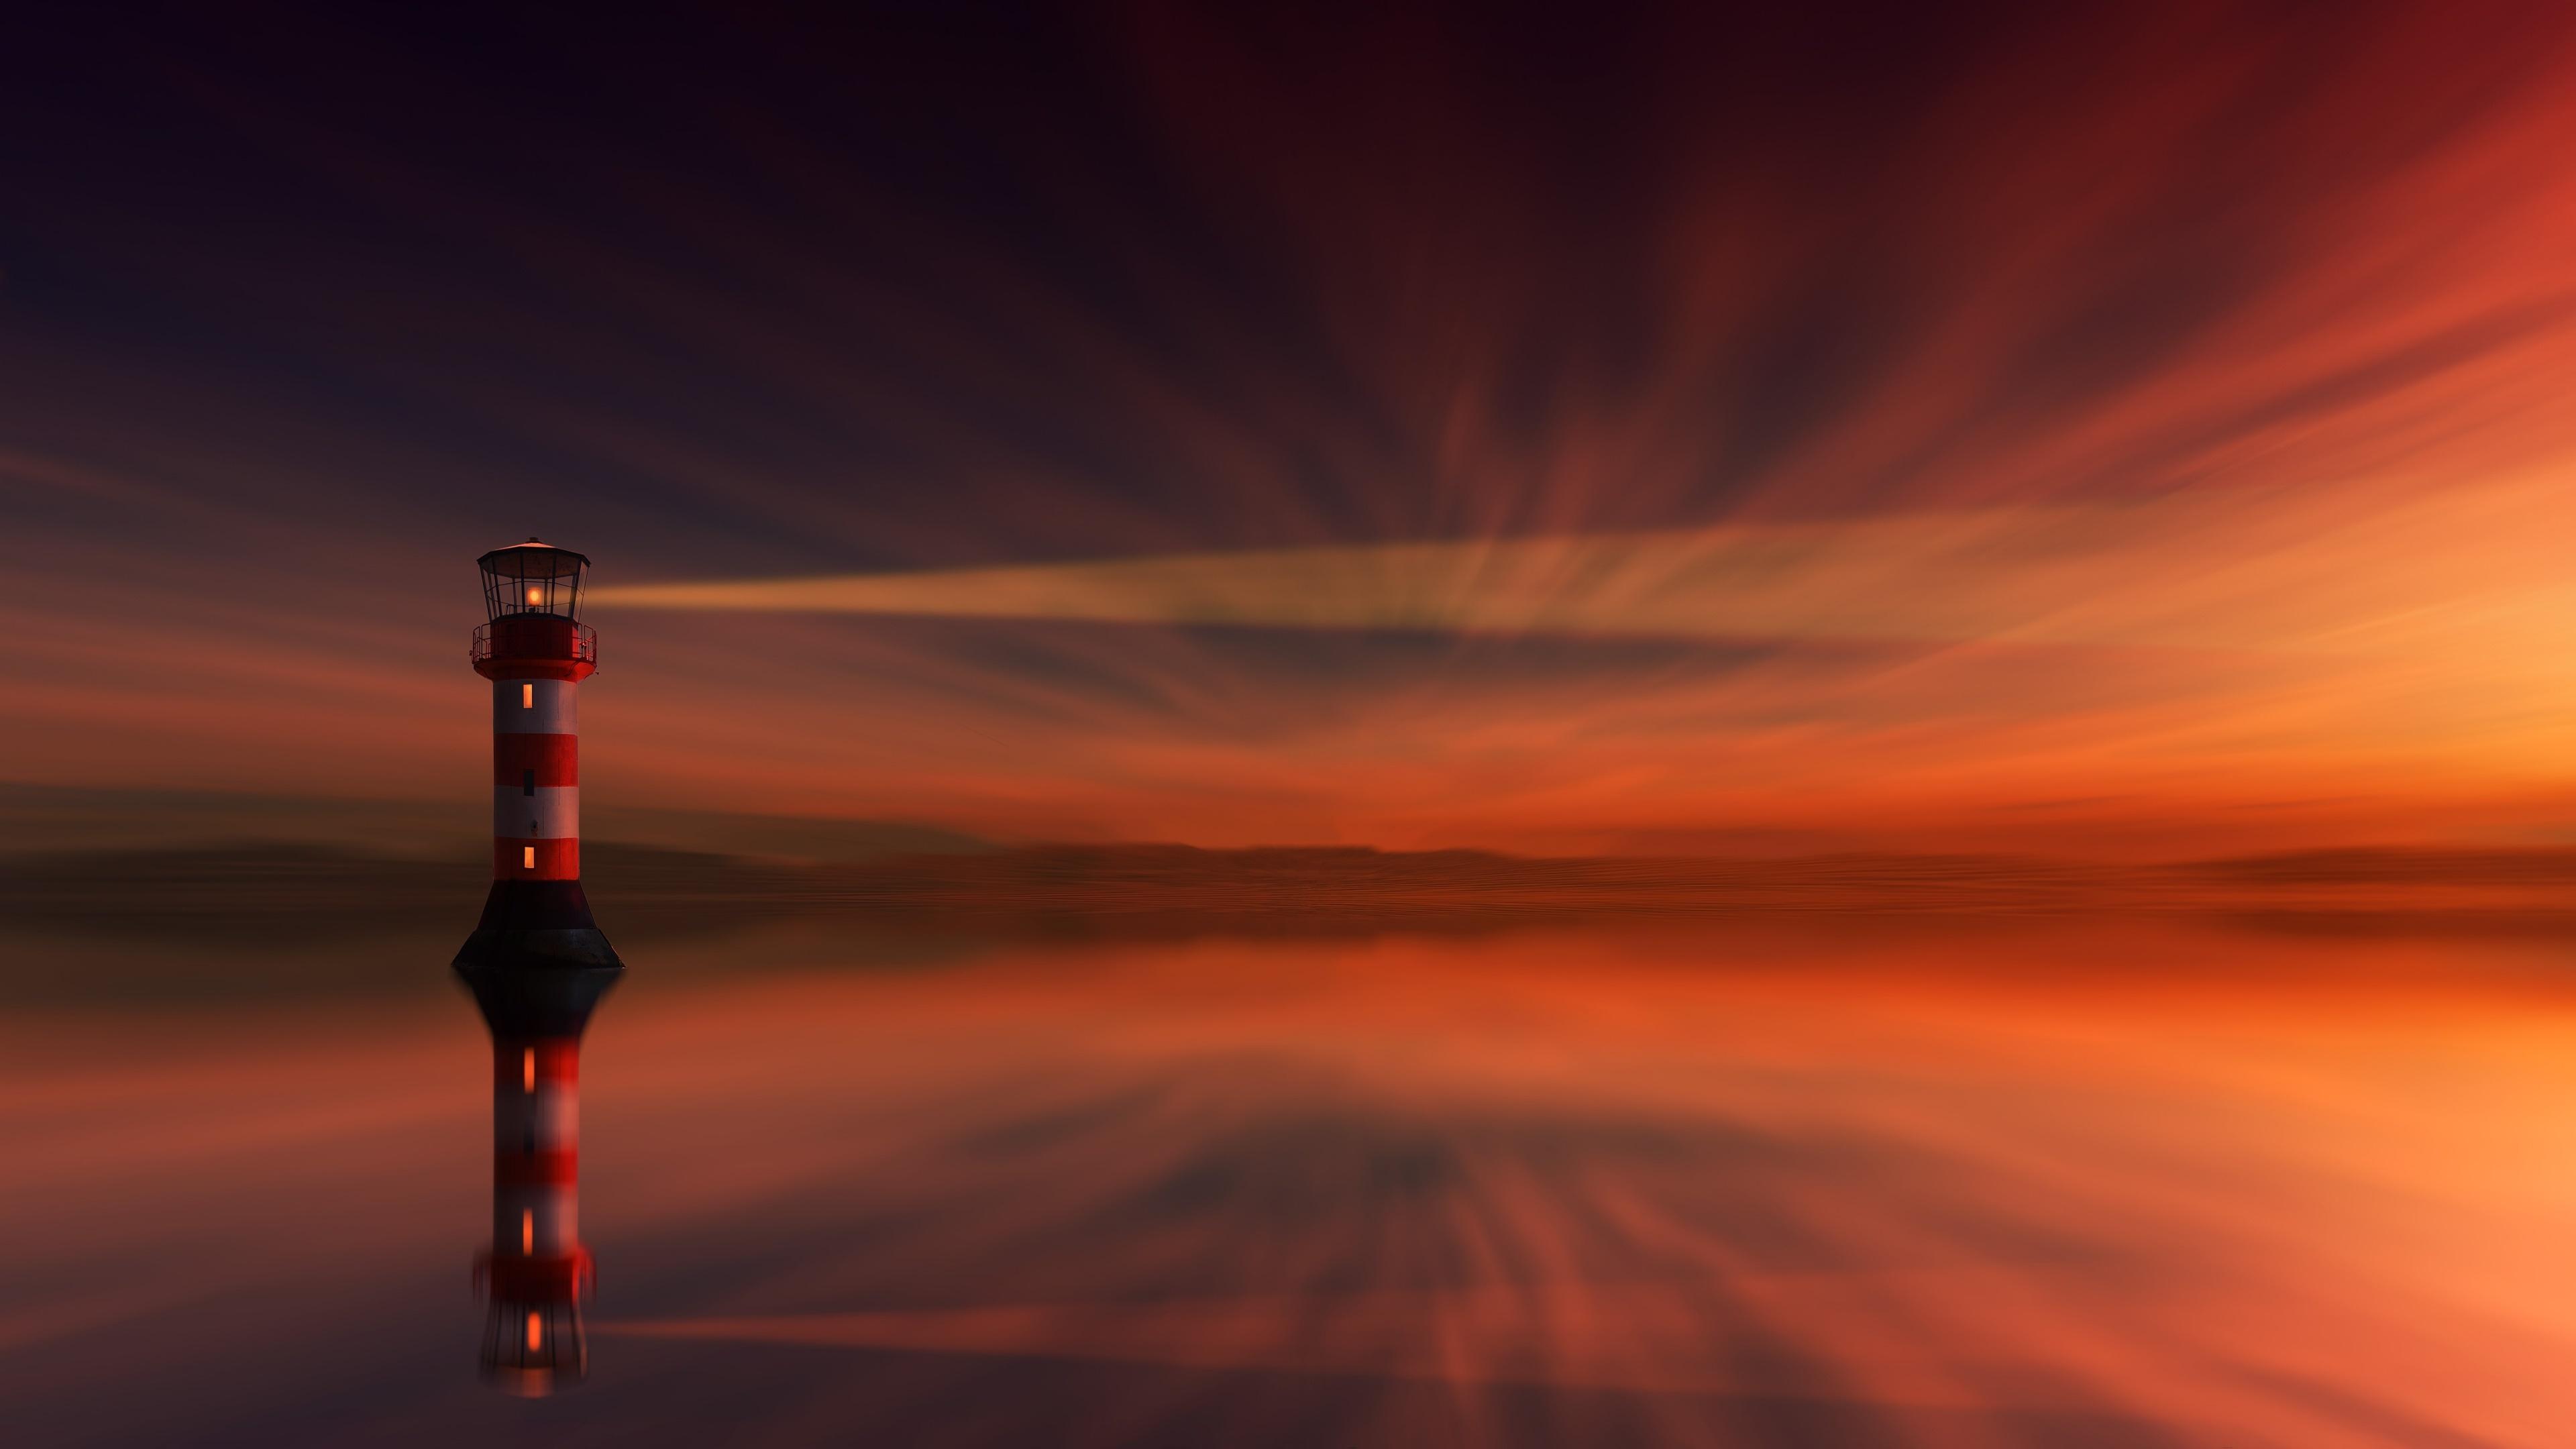 Lighthouse at sunset wallpaper